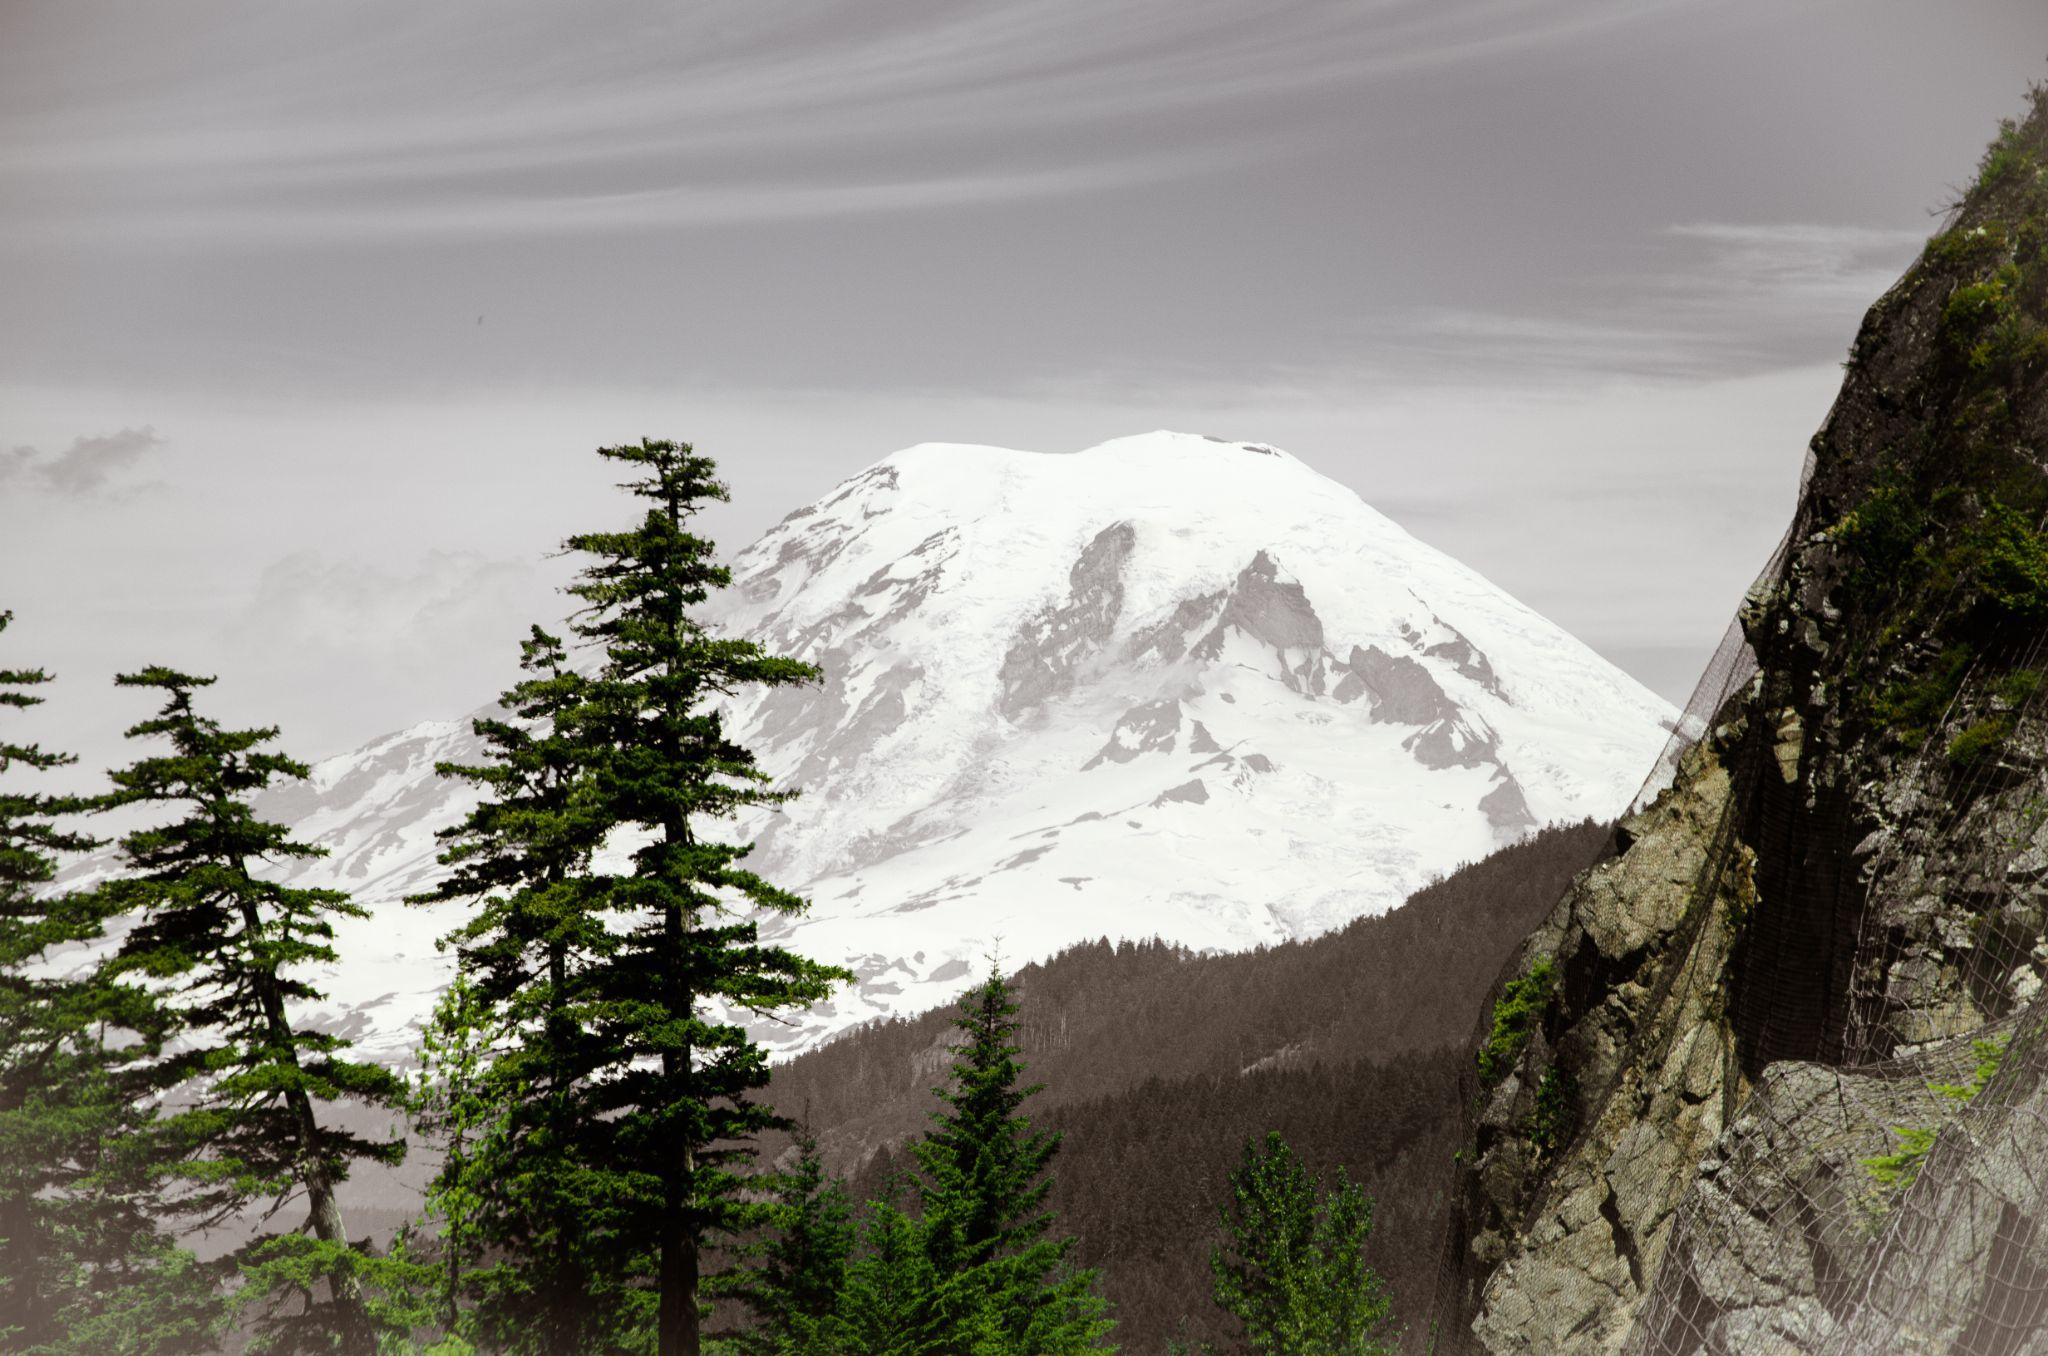 MT. Rainier by Judy Brewer